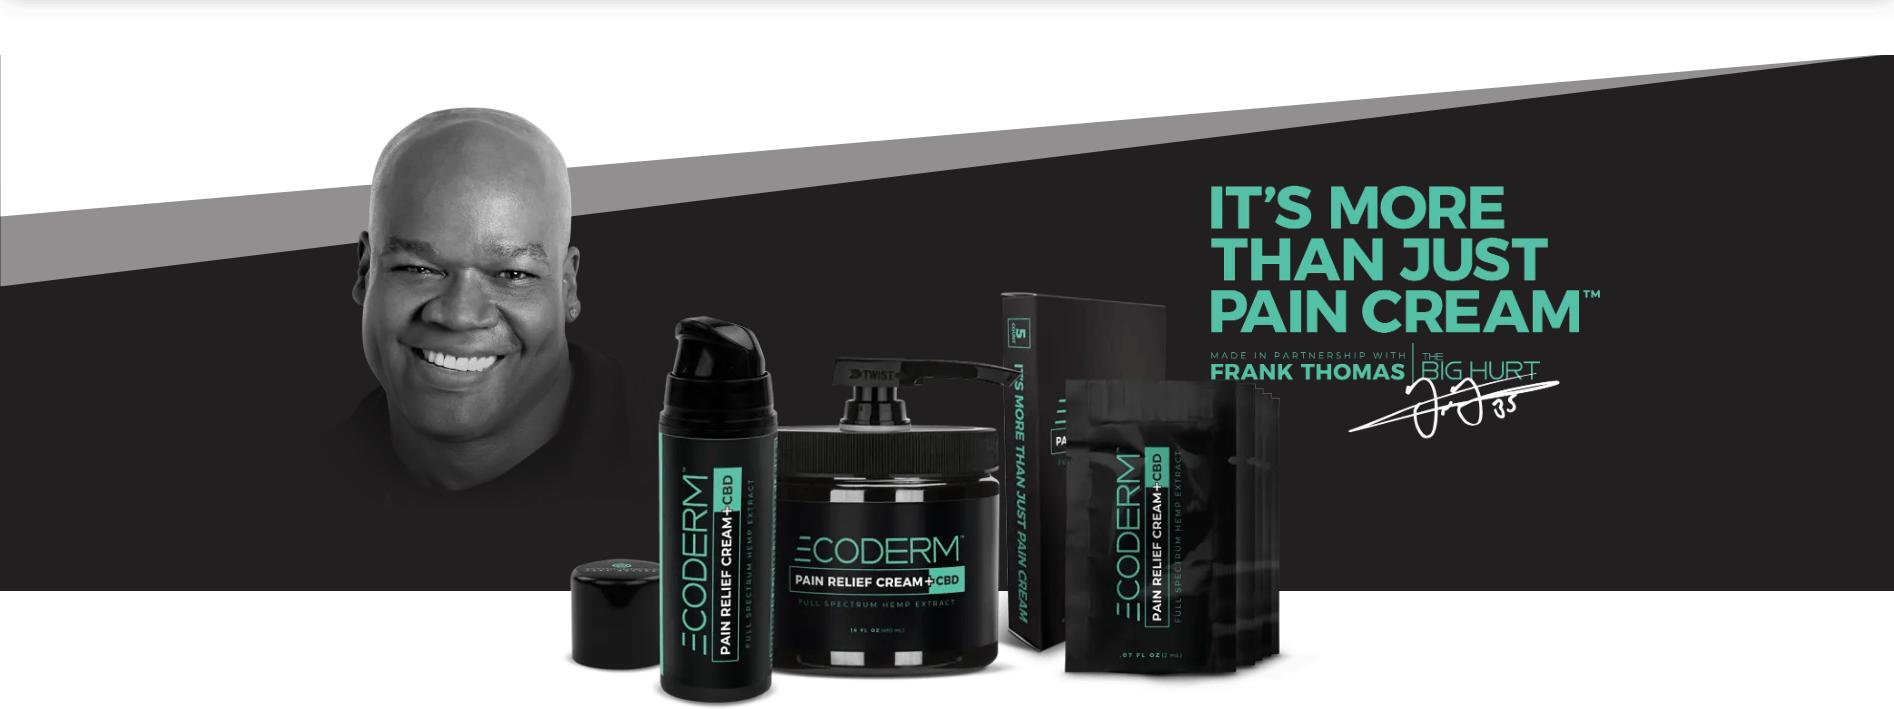 EcoSciences CBD Coupon Code Pain Relief Cream